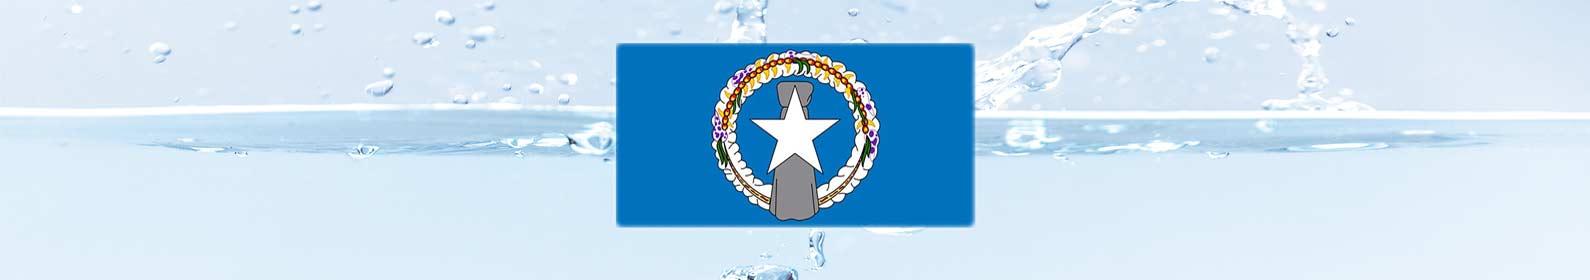 water-treatment-northern-mariana-islands.jpg